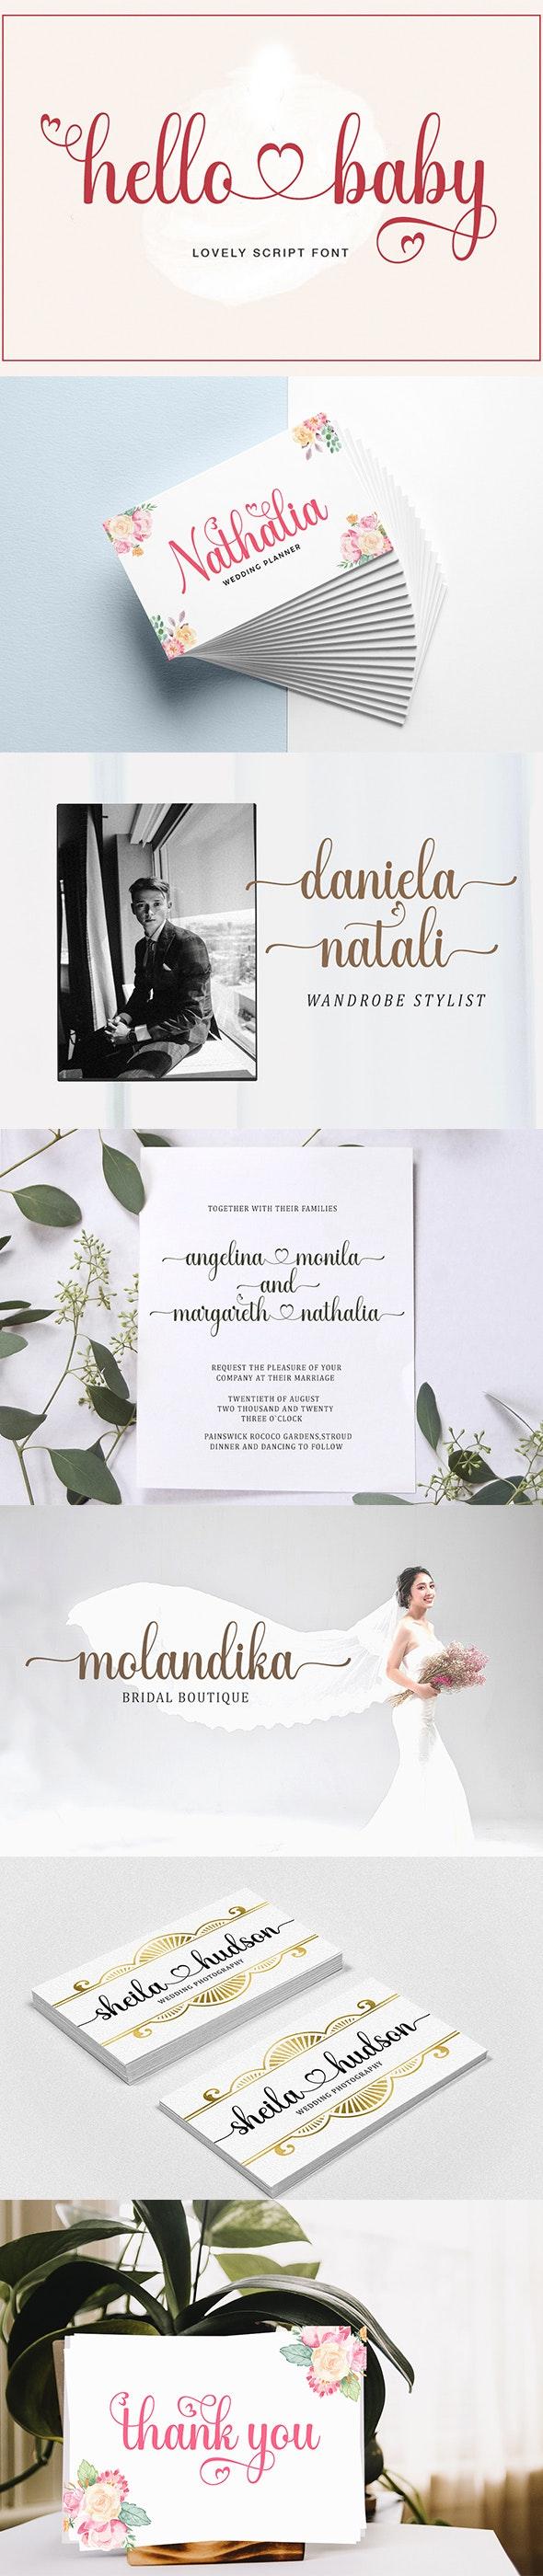 hello baby - Lovely Script font - Script Fonts